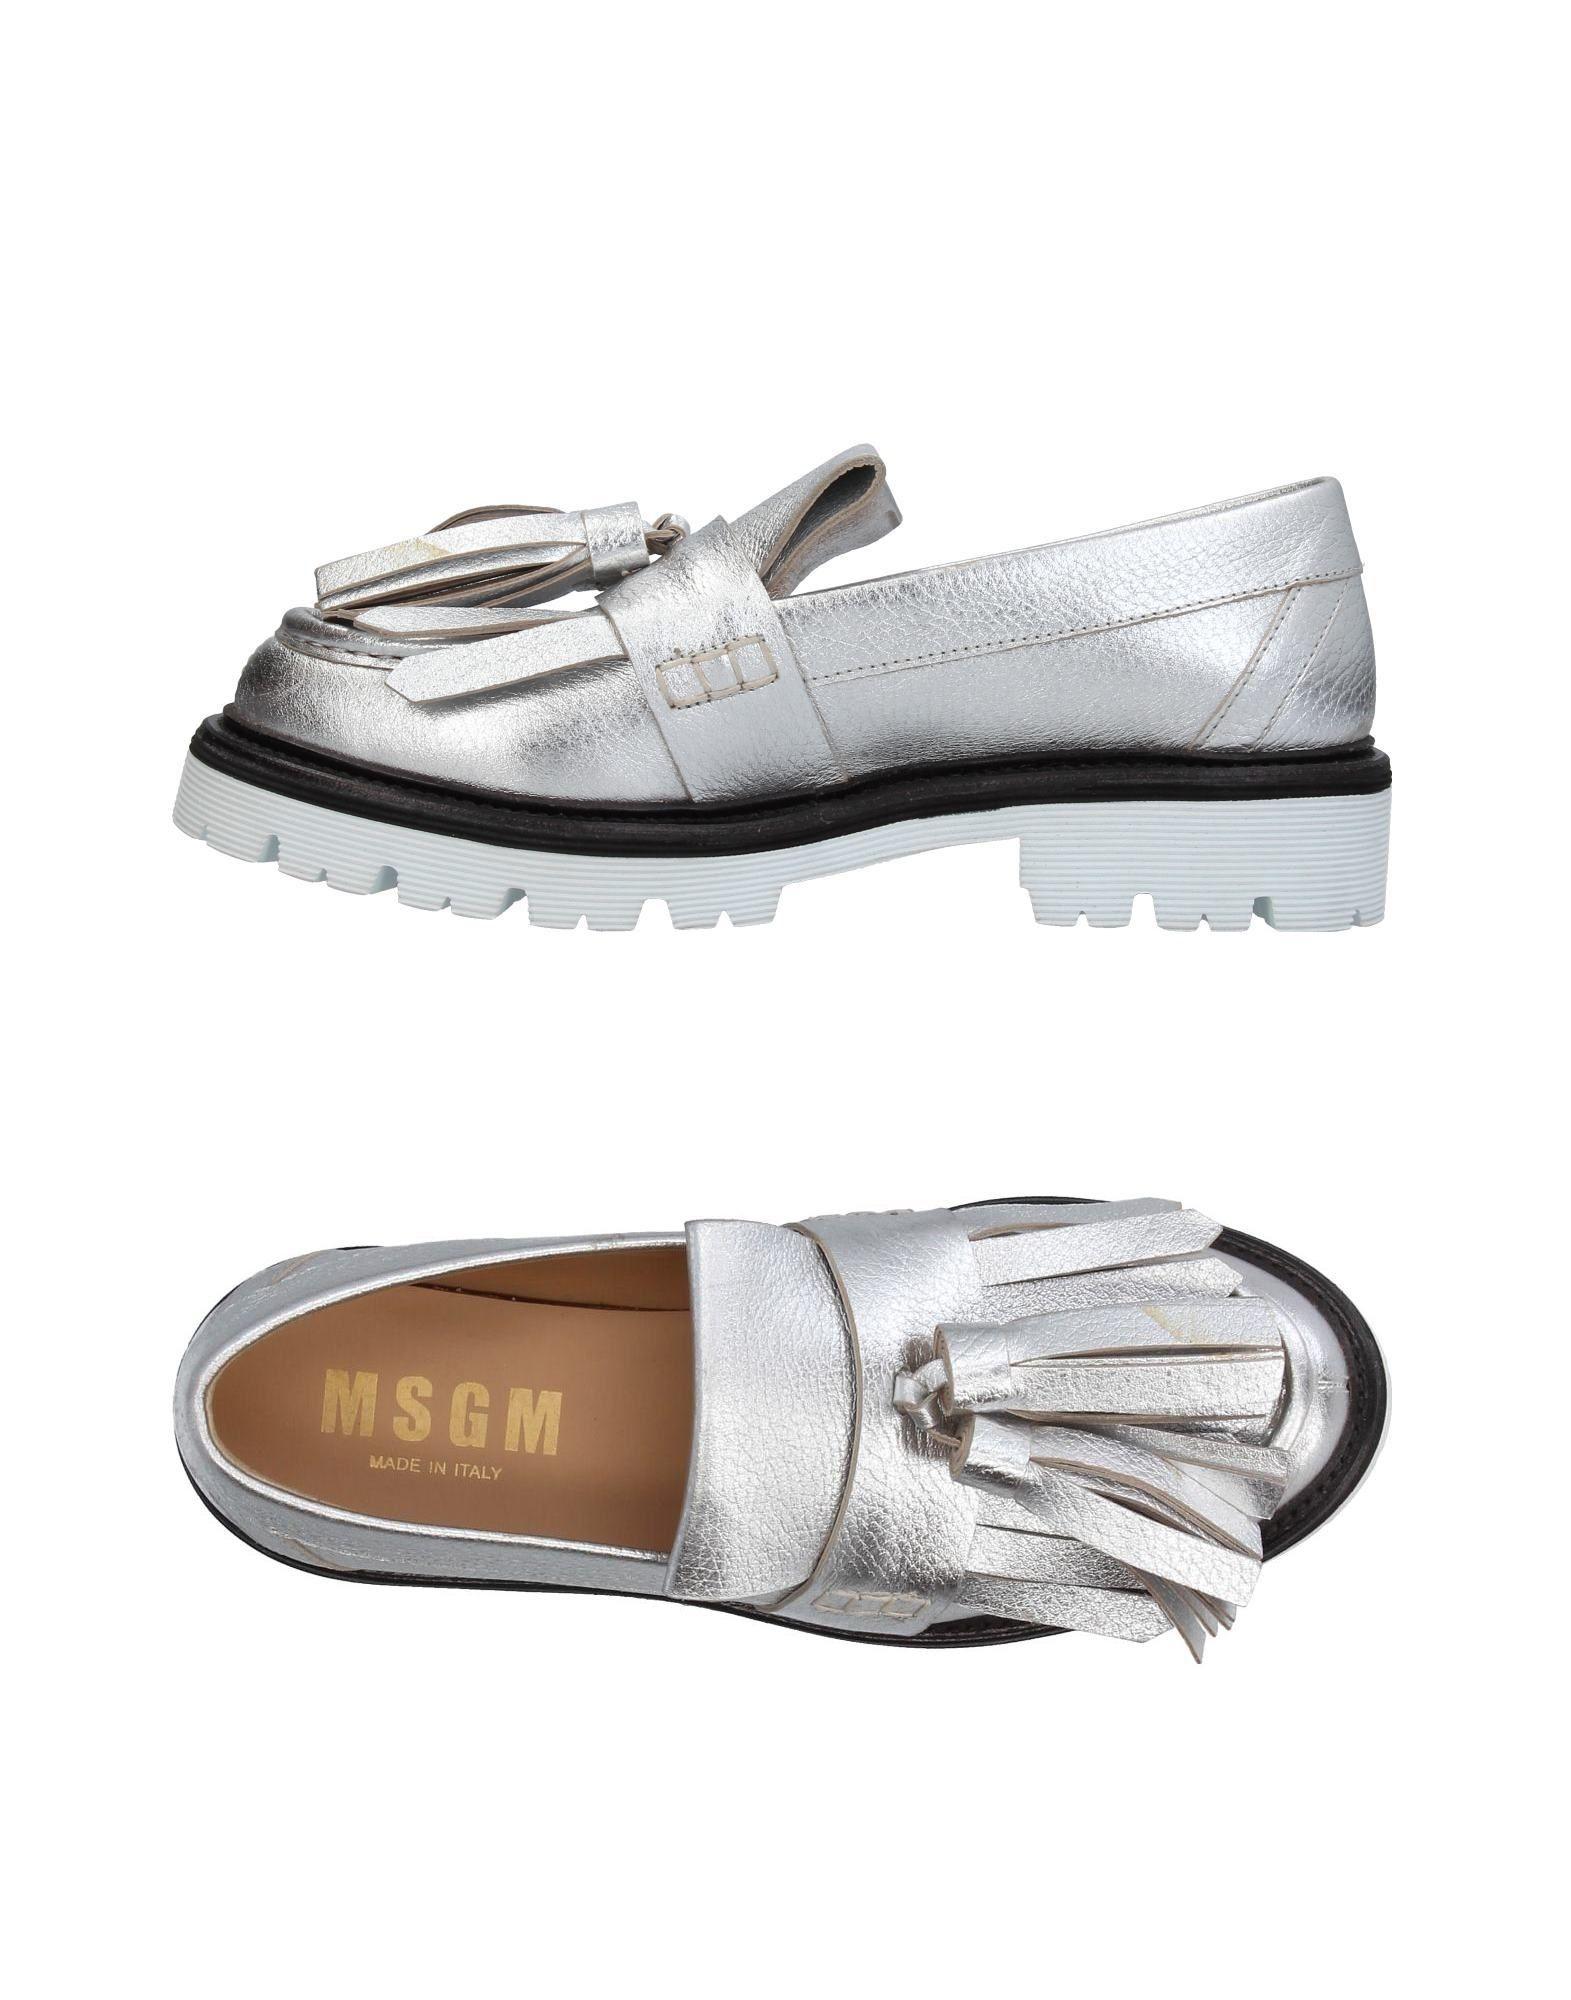 Moda Mocassino Msgm Donna - 11380894CF